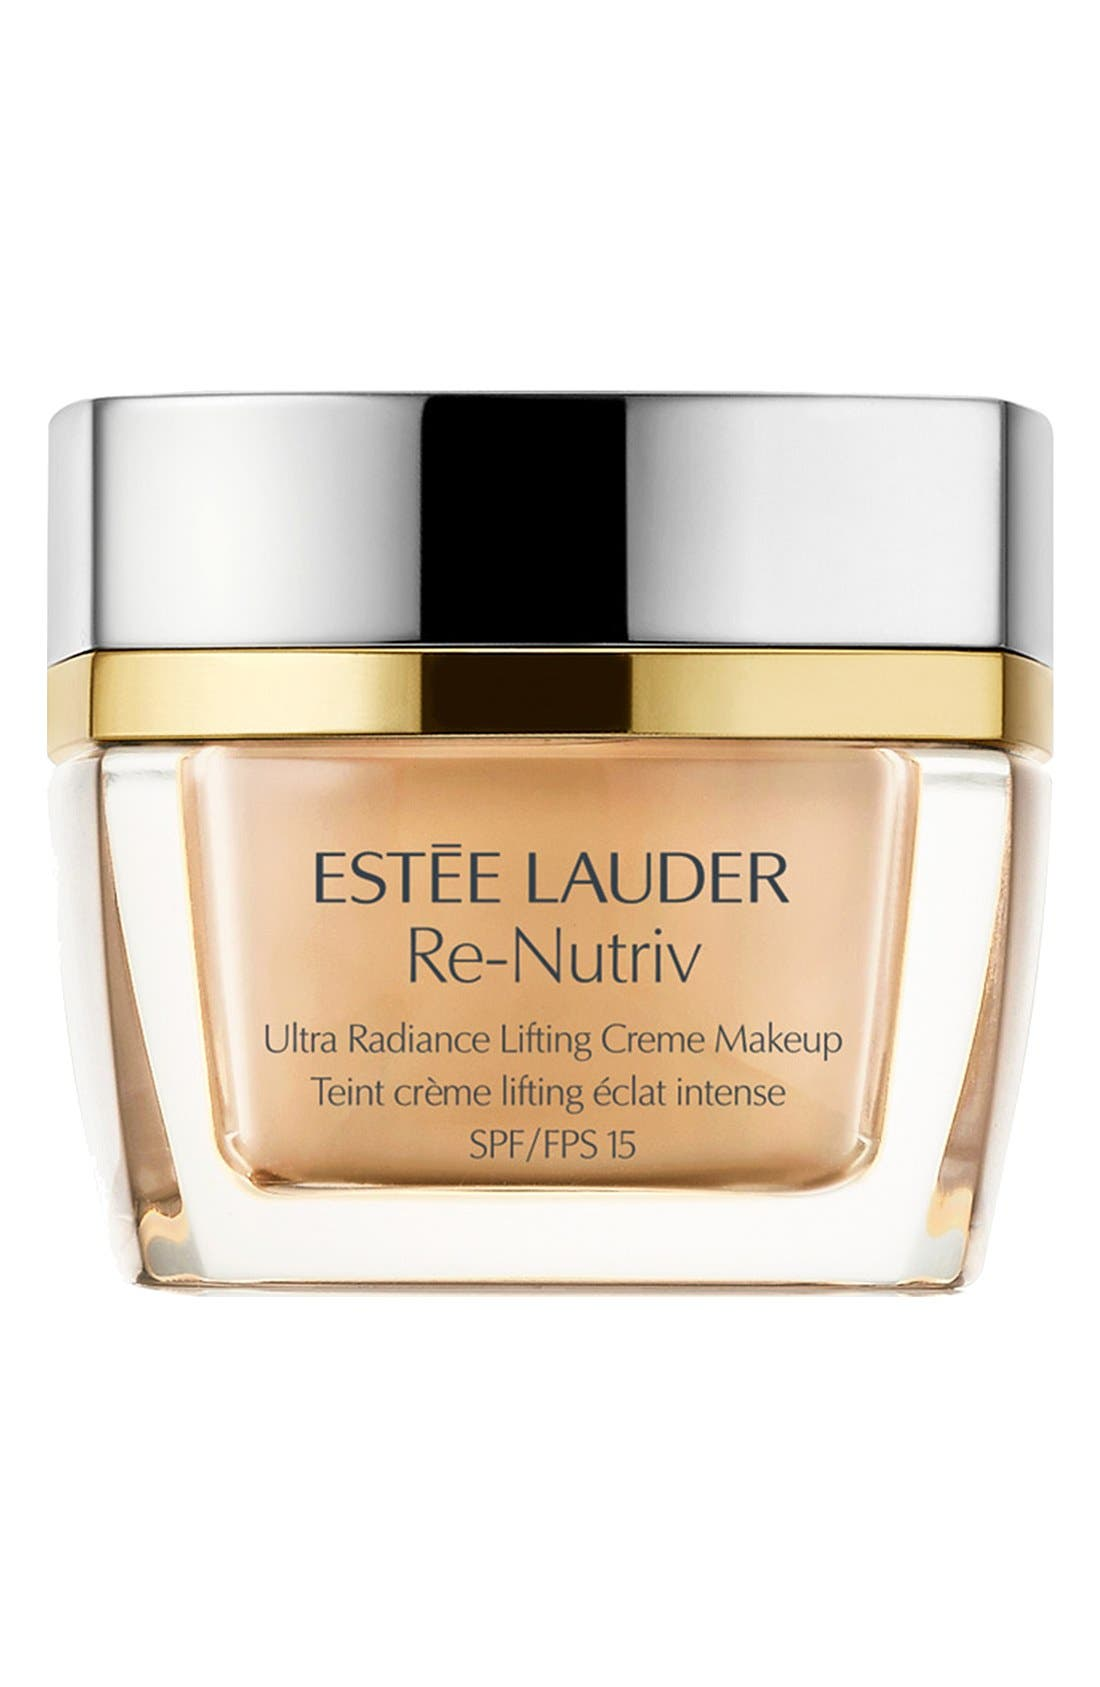 Estée Lauder Re-Nutriv Ultra Radiance Lifting Crème Makeup